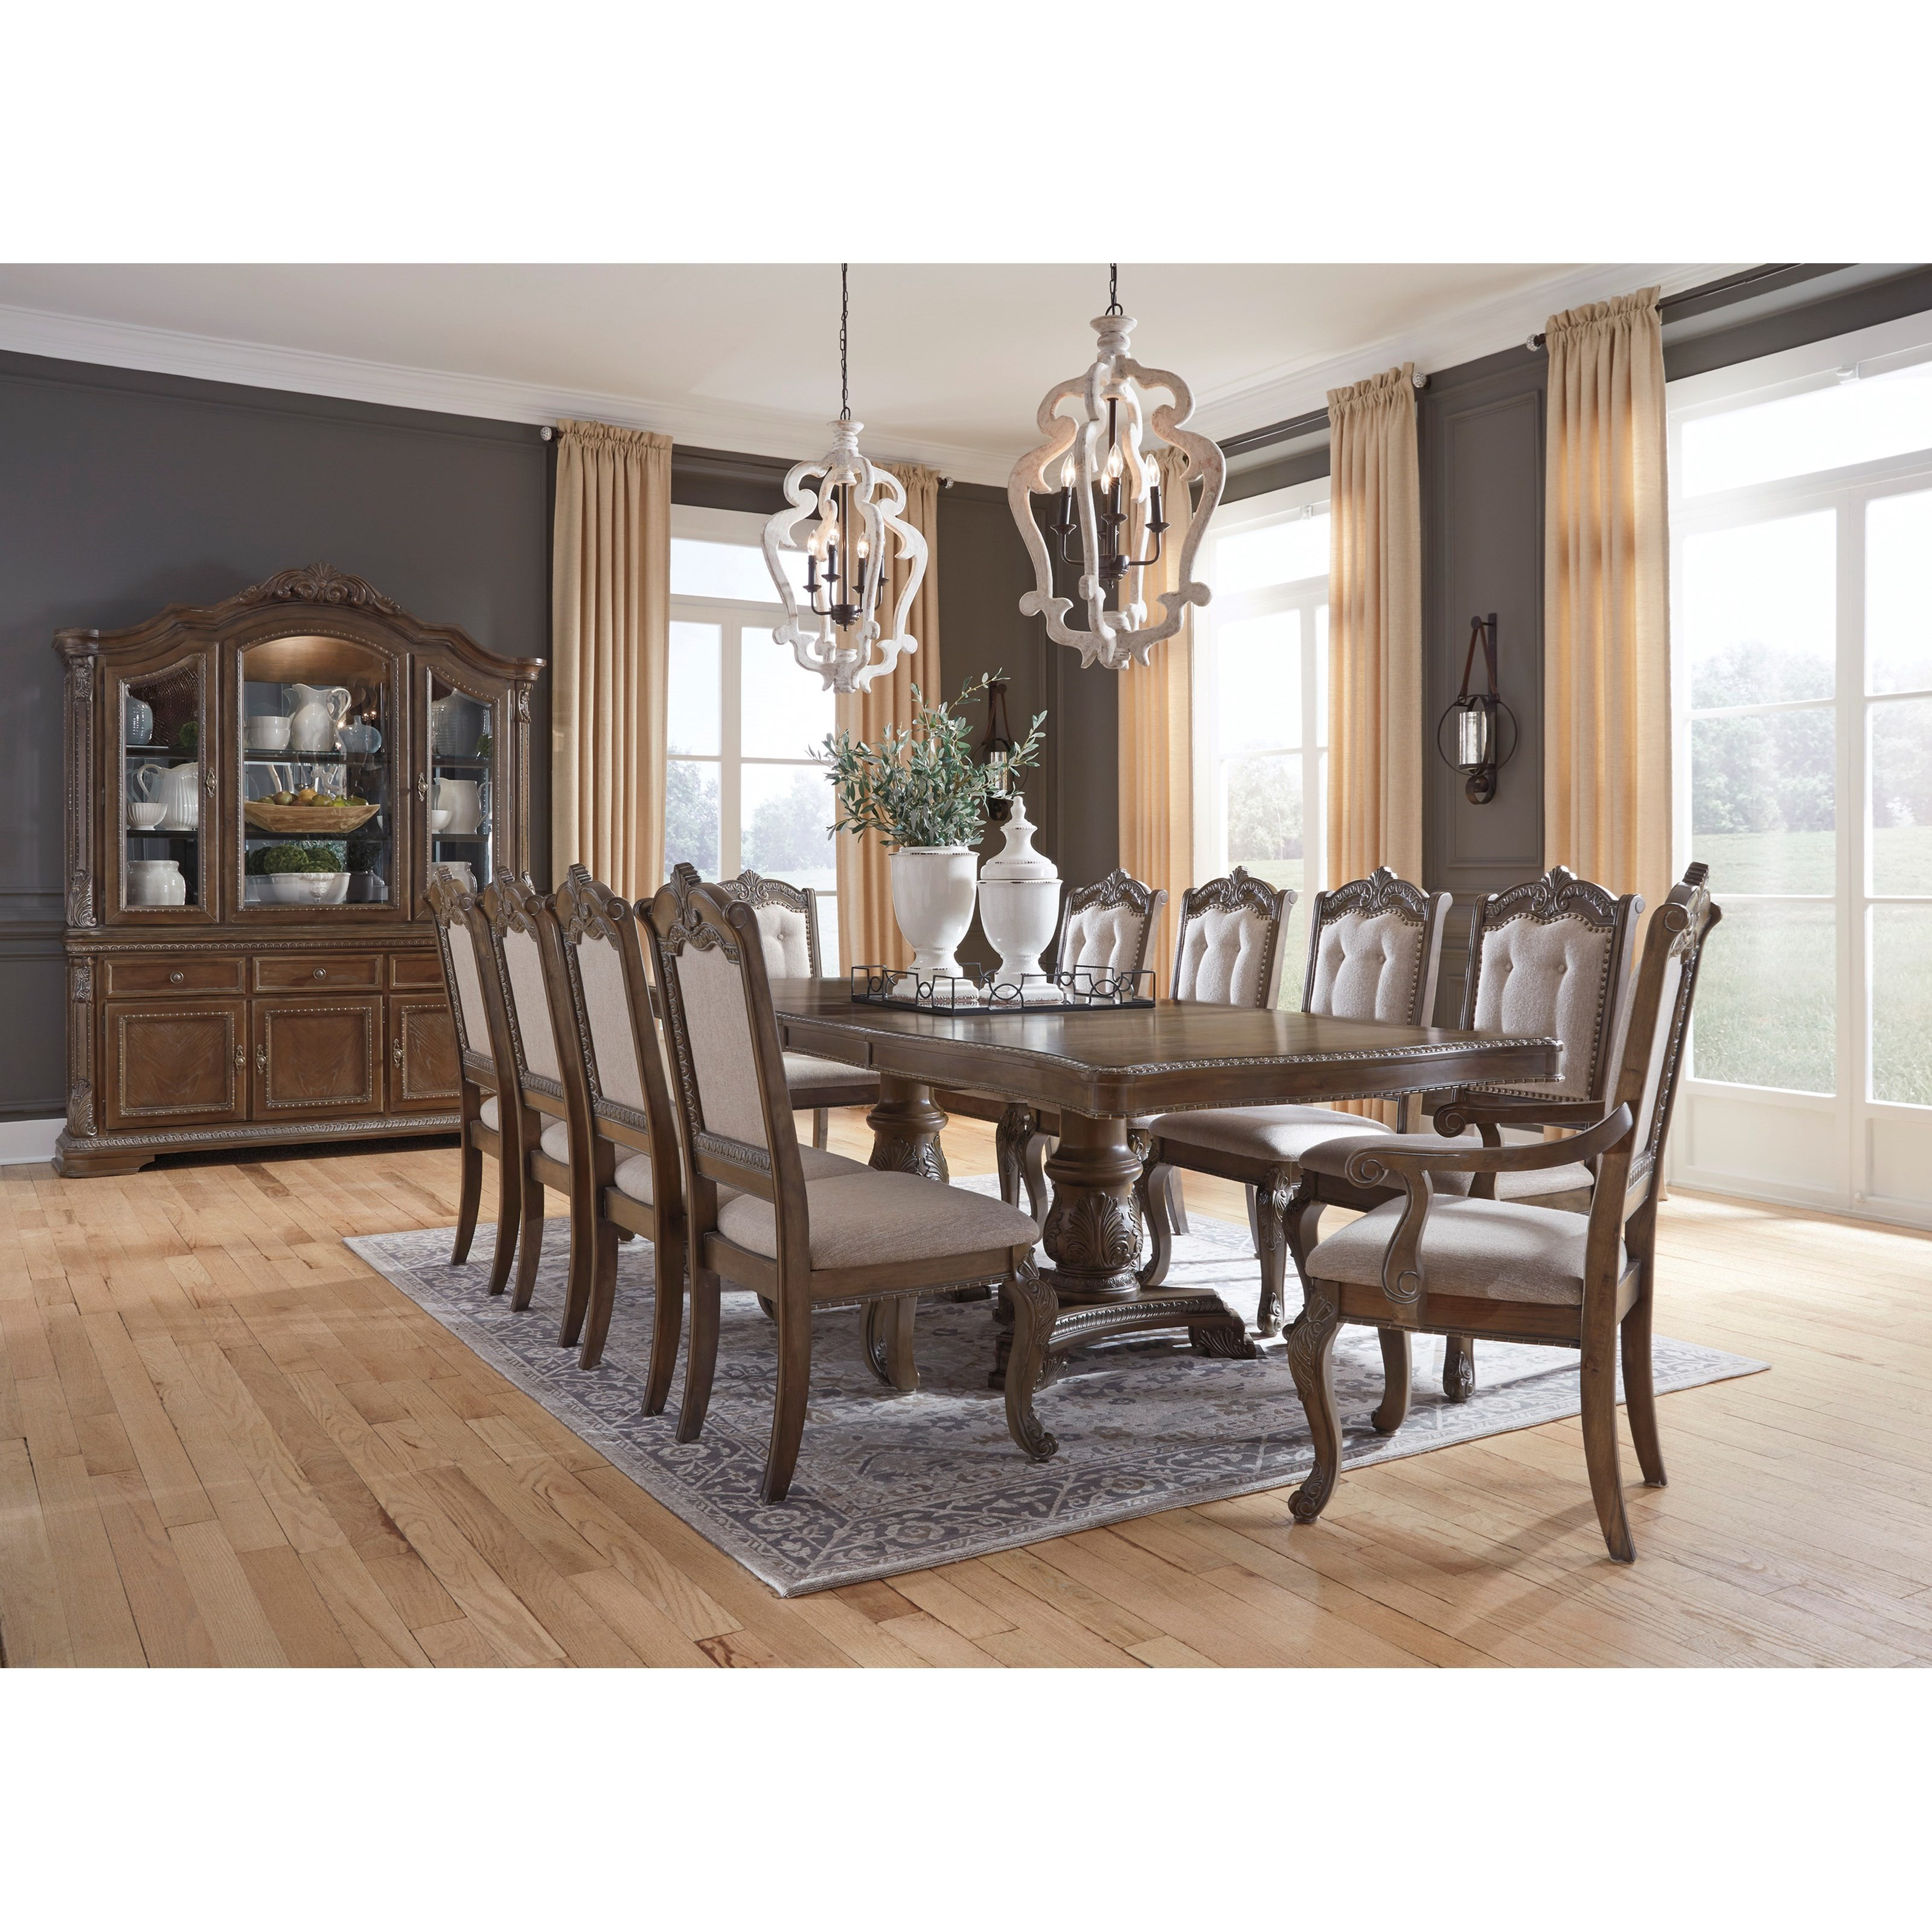 Ashley Realyn 5 Piece Rectangular Dining Table Set D743-45 ...